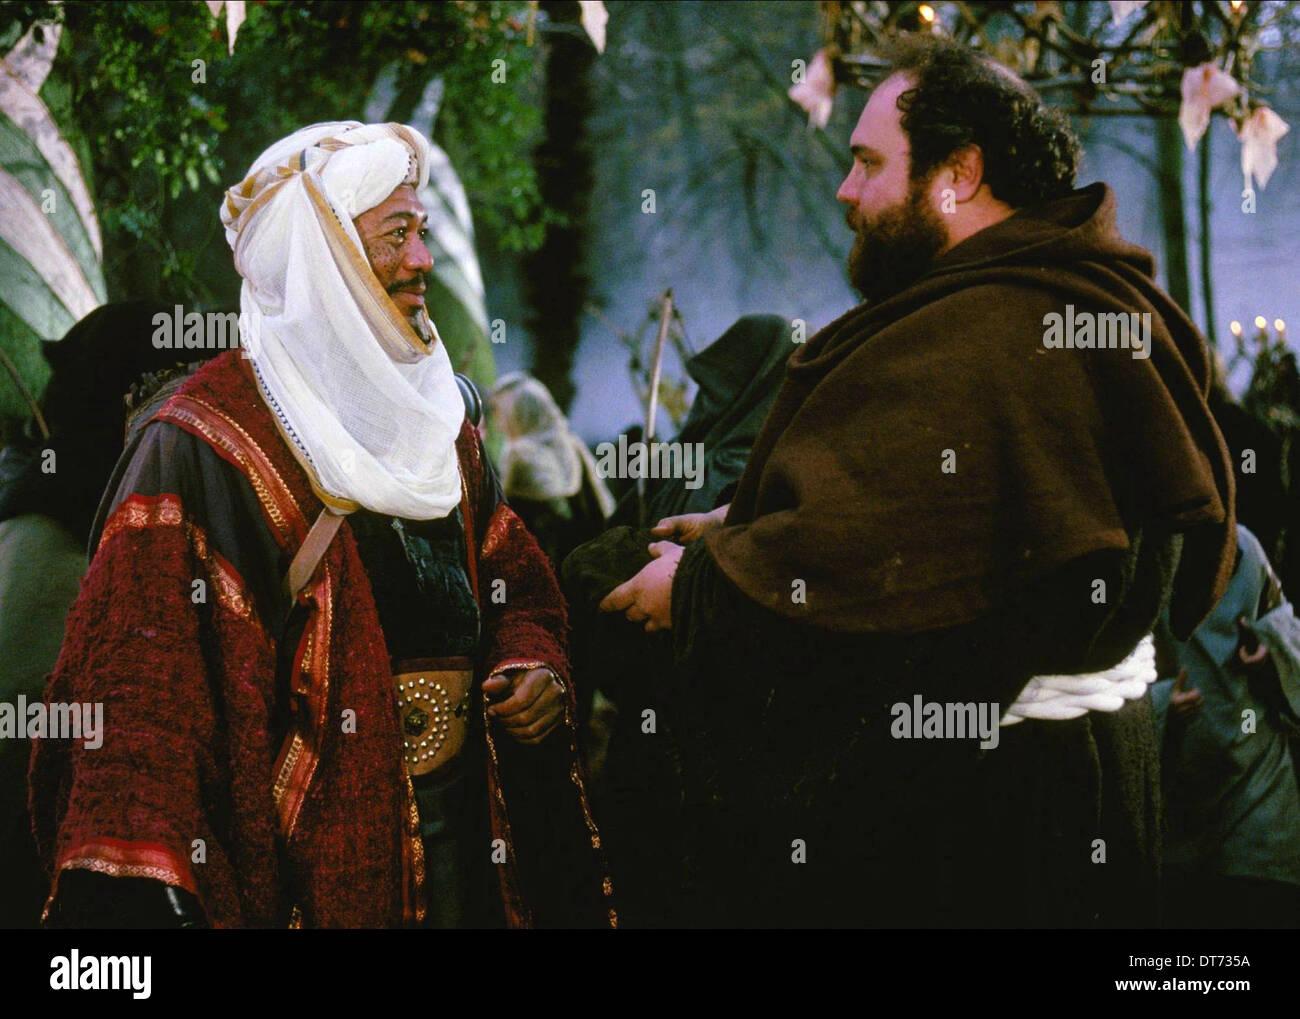 MORGAN FREEMAN & MICHAEL MCSHANE ROBIN HOOD: PRINCE OF THIEVES (1991) - Stock Image